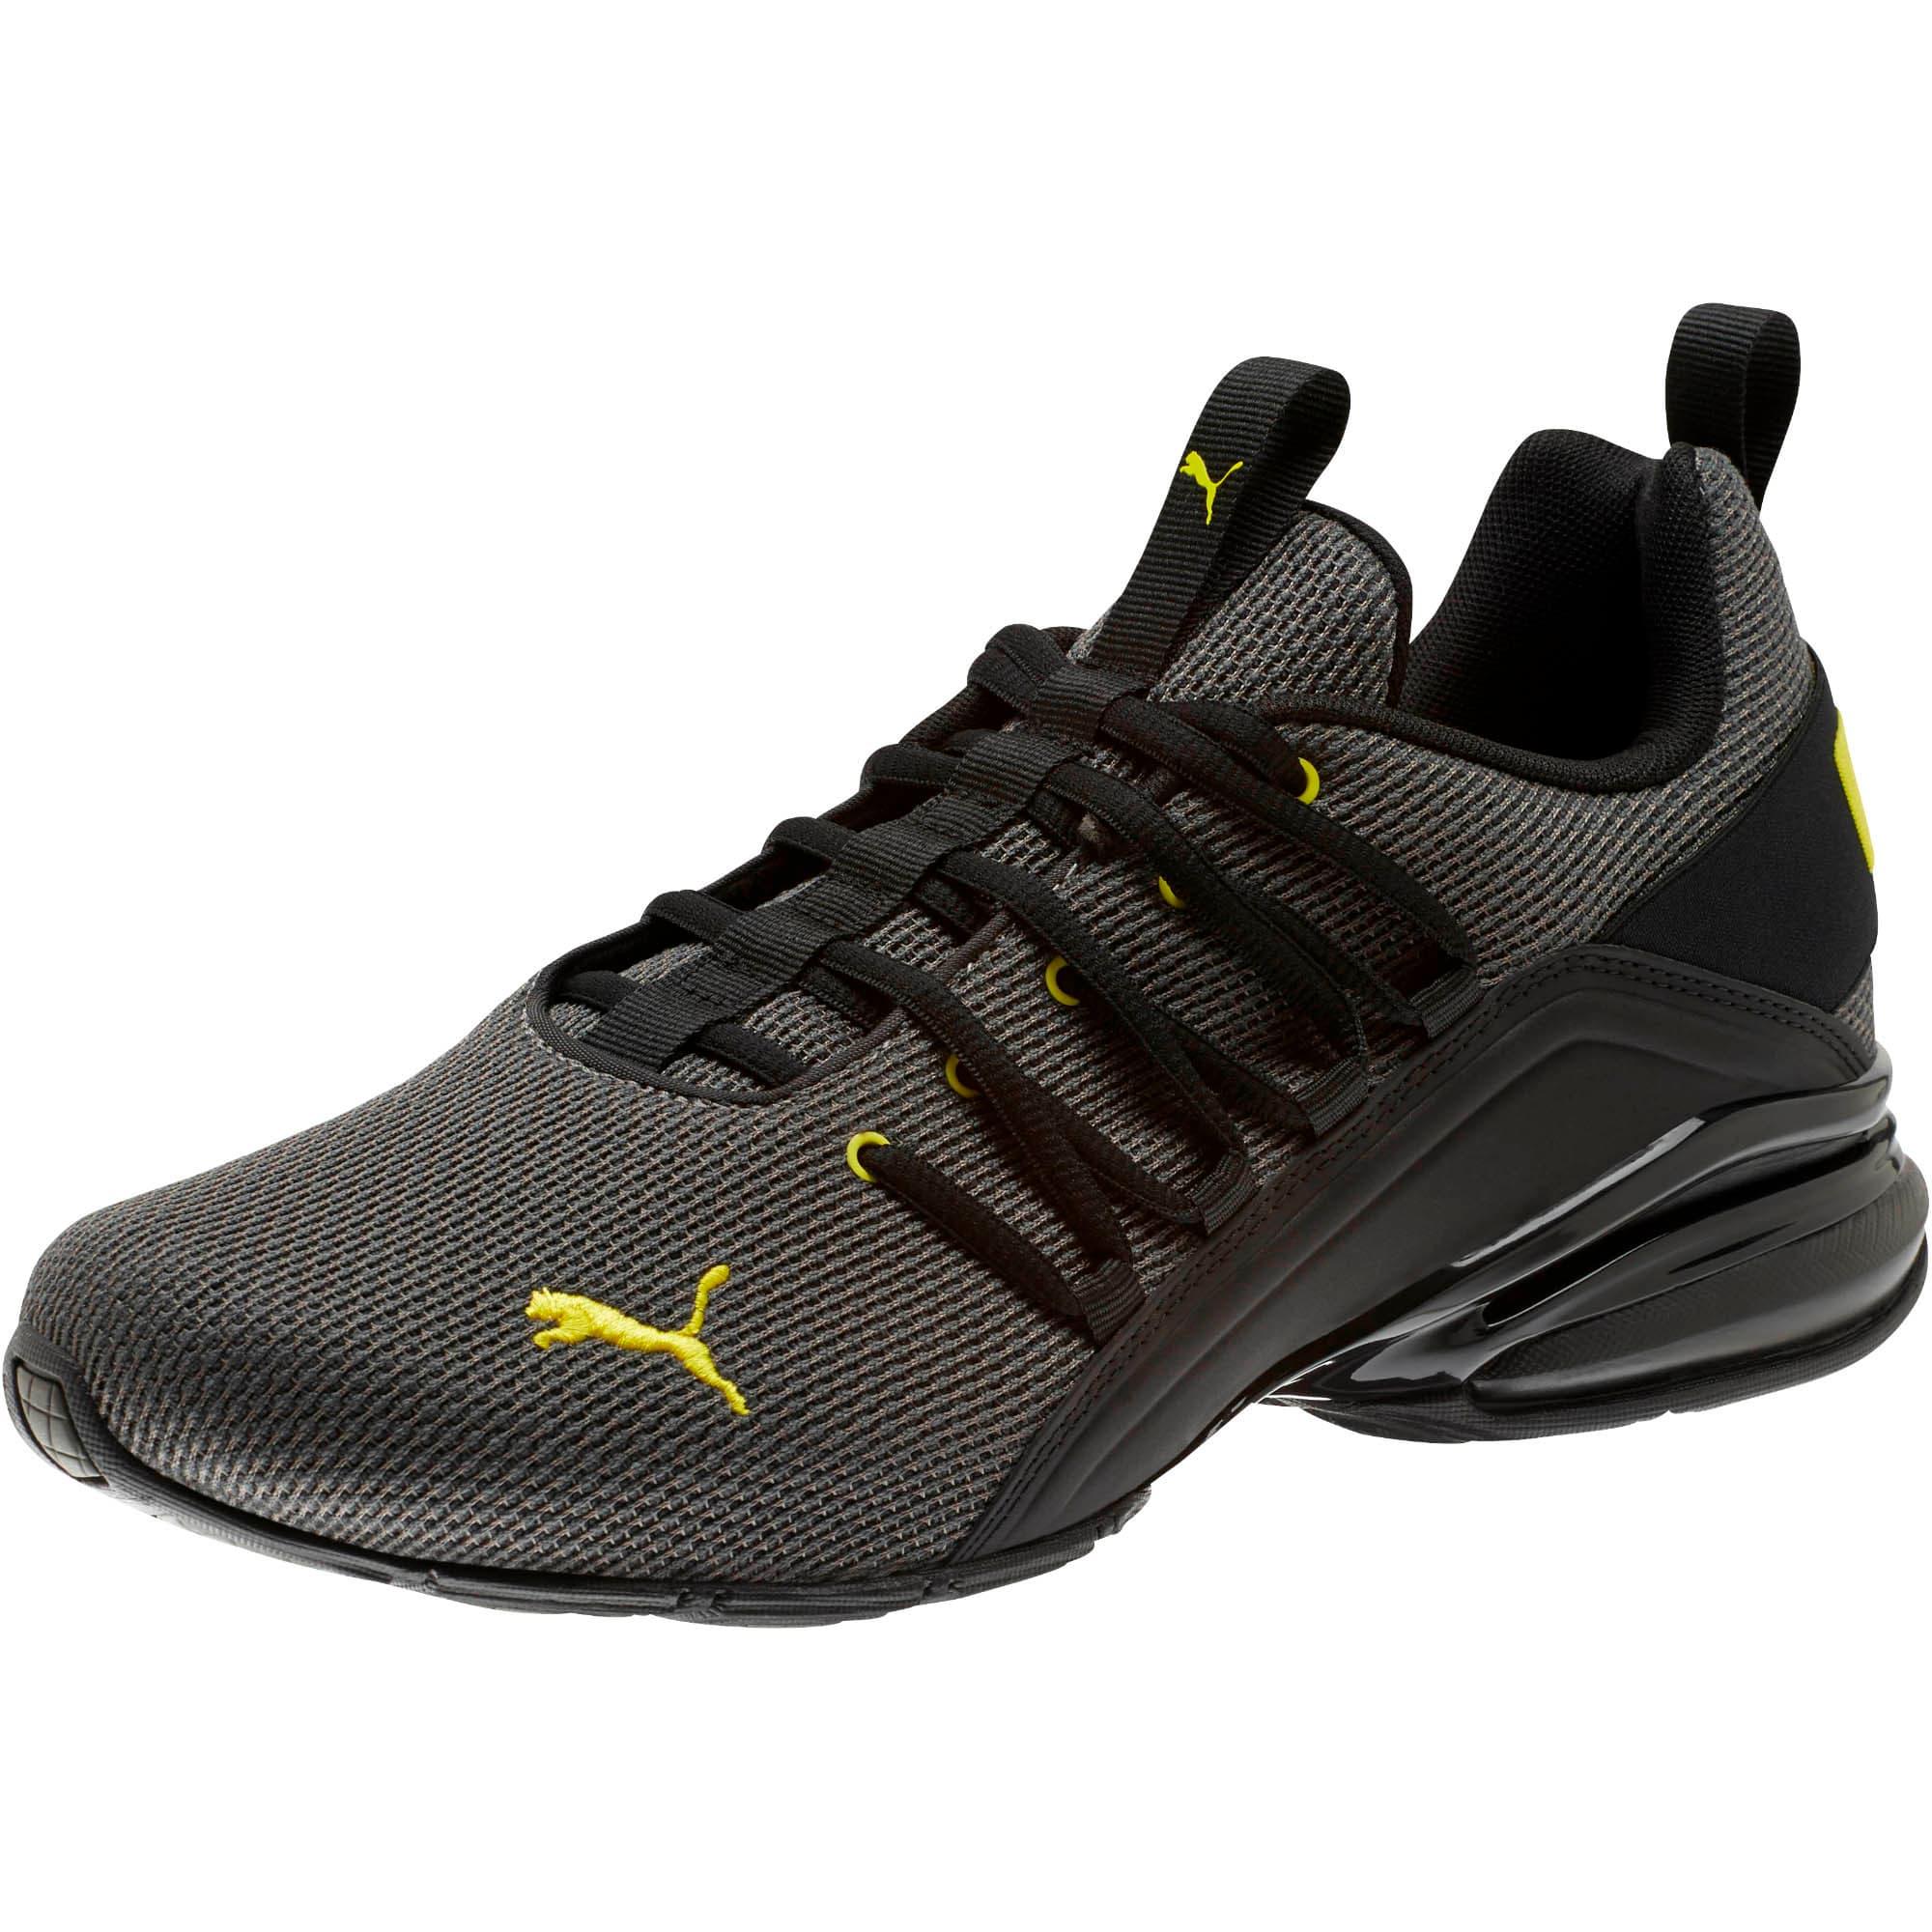 Thumbnail 1 of Axelion Mesh Men's Training Shoes, Charcoal Gray-Blazing Yellow, medium